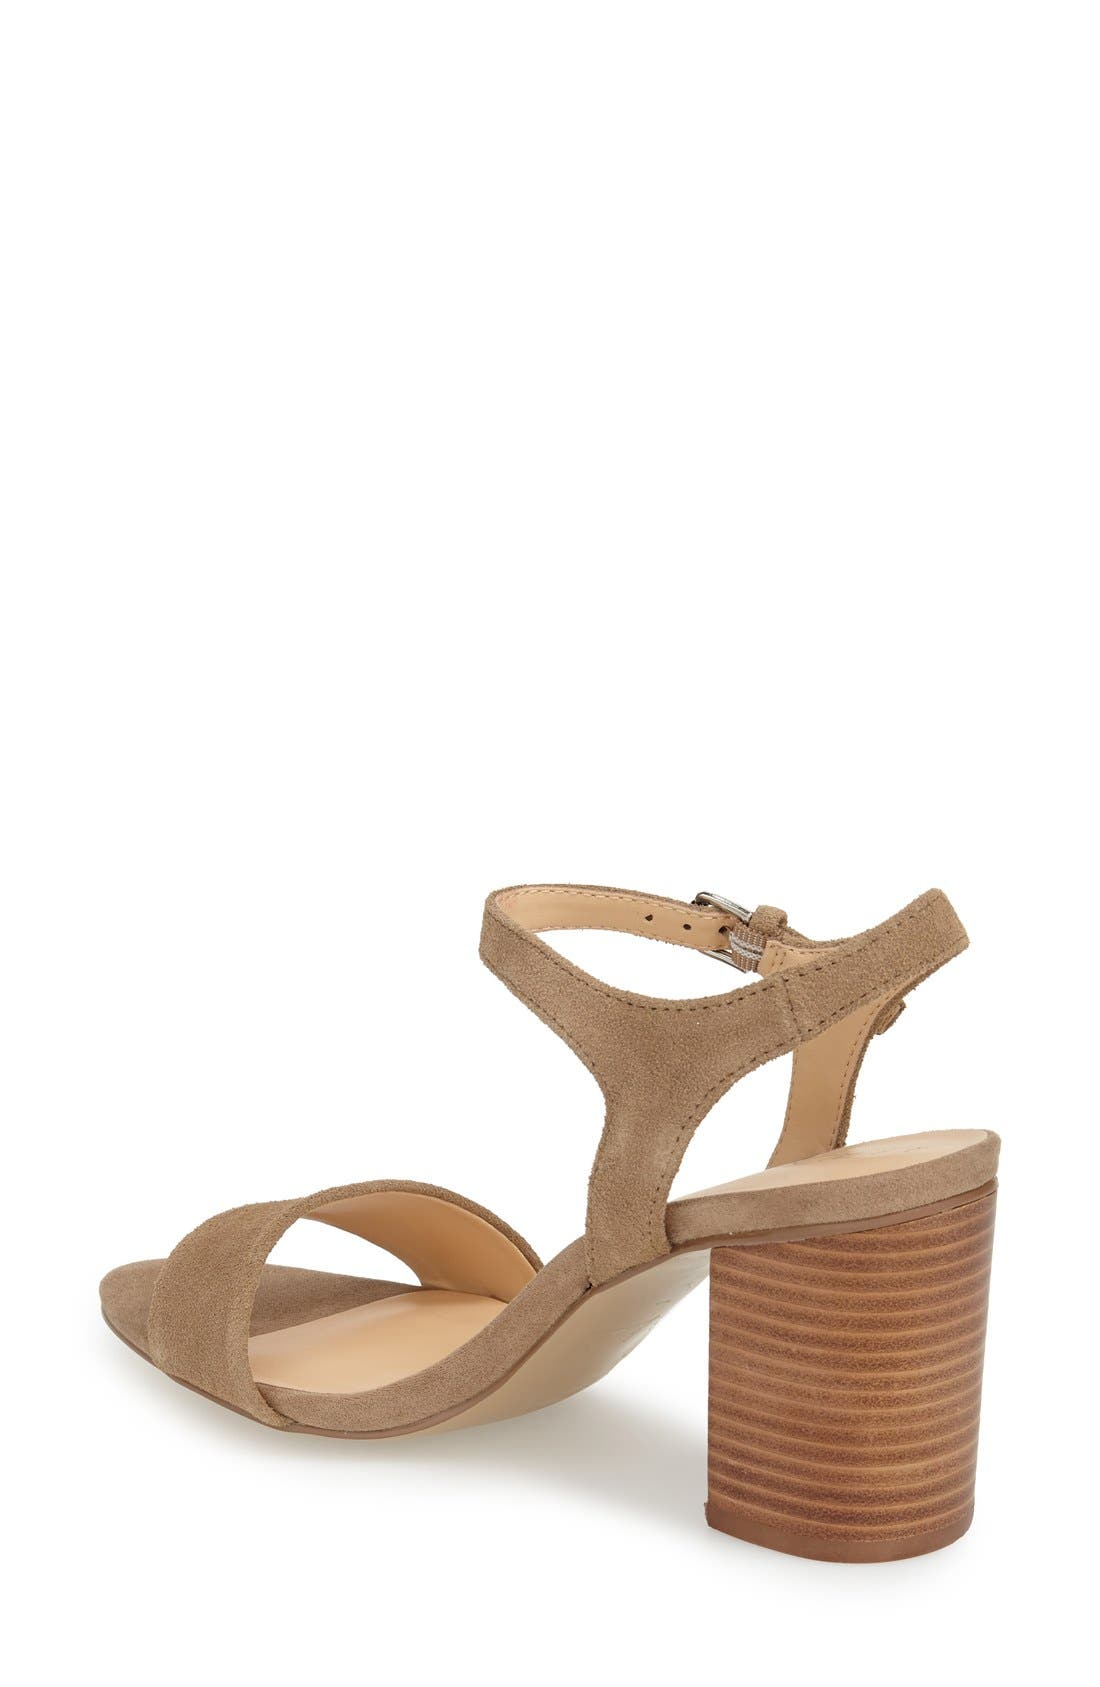 'Linny' Ankle Strap Sandal,                             Alternate thumbnail 8, color,